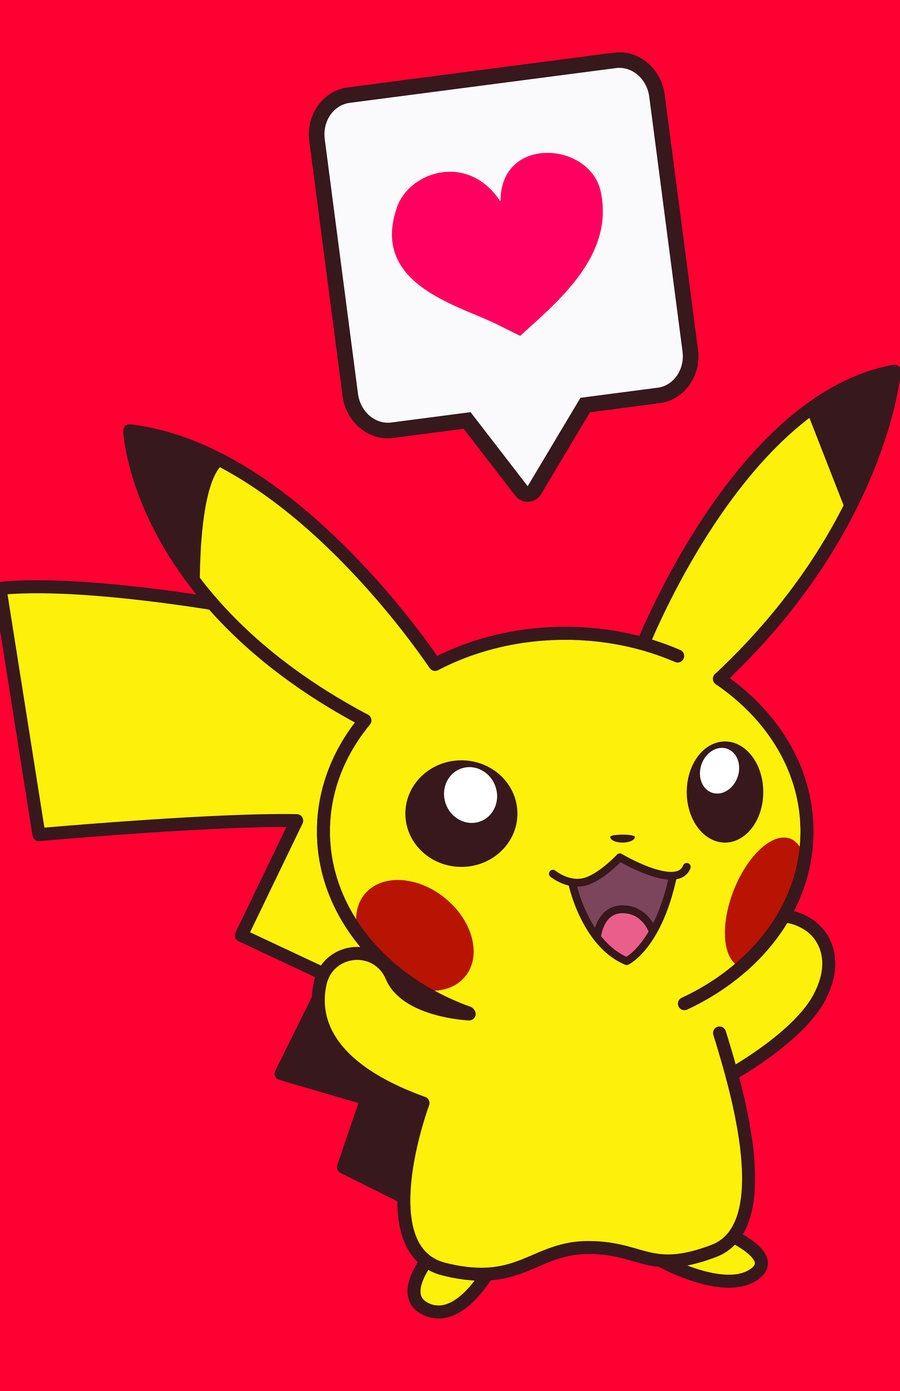 Pokemon fan art - Cute Pikachu | Gaming pins | Pinterest